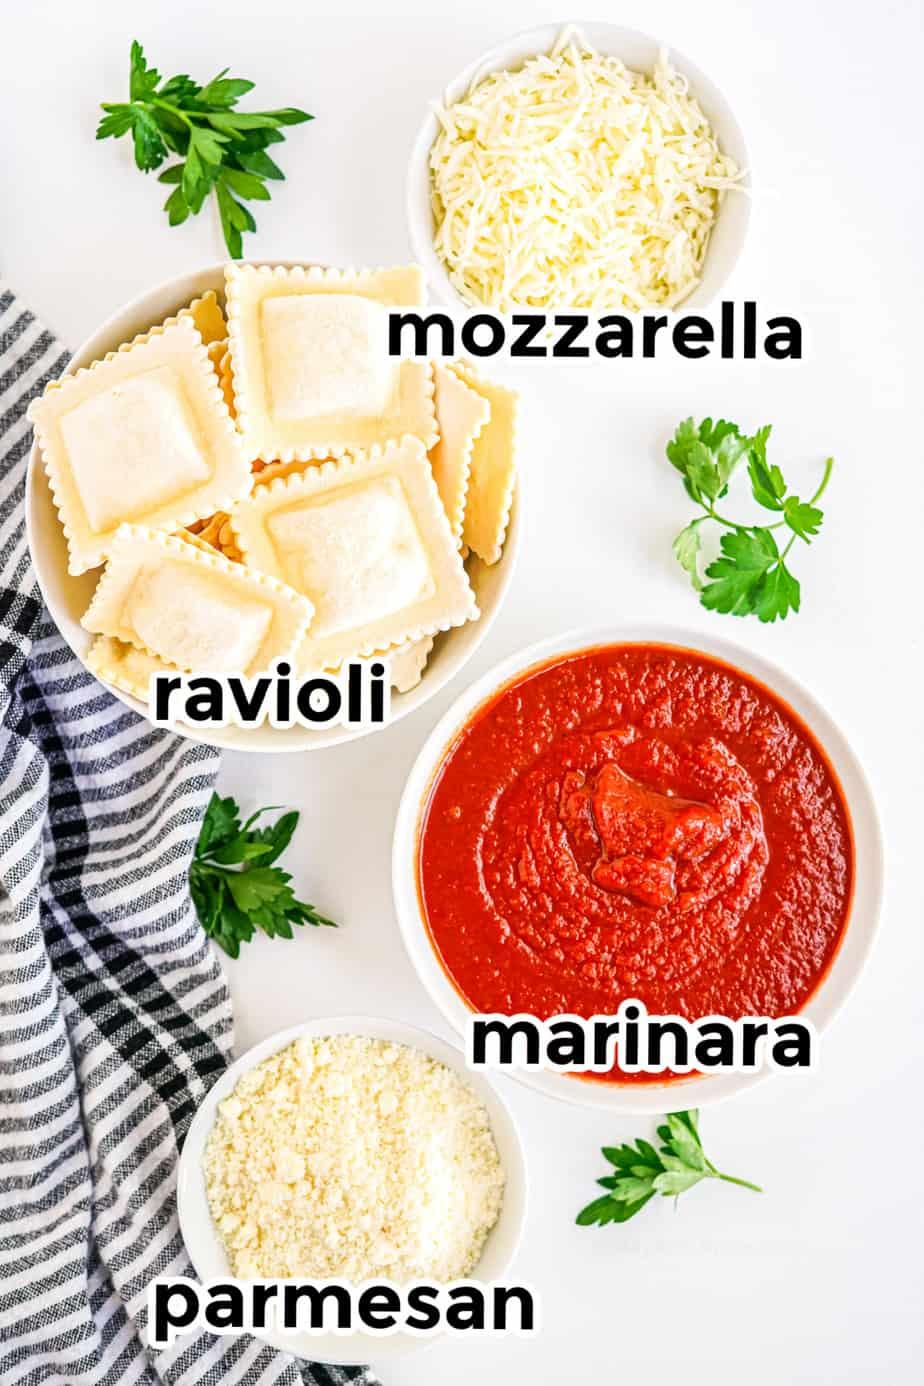 Ingredients for baked ravioli